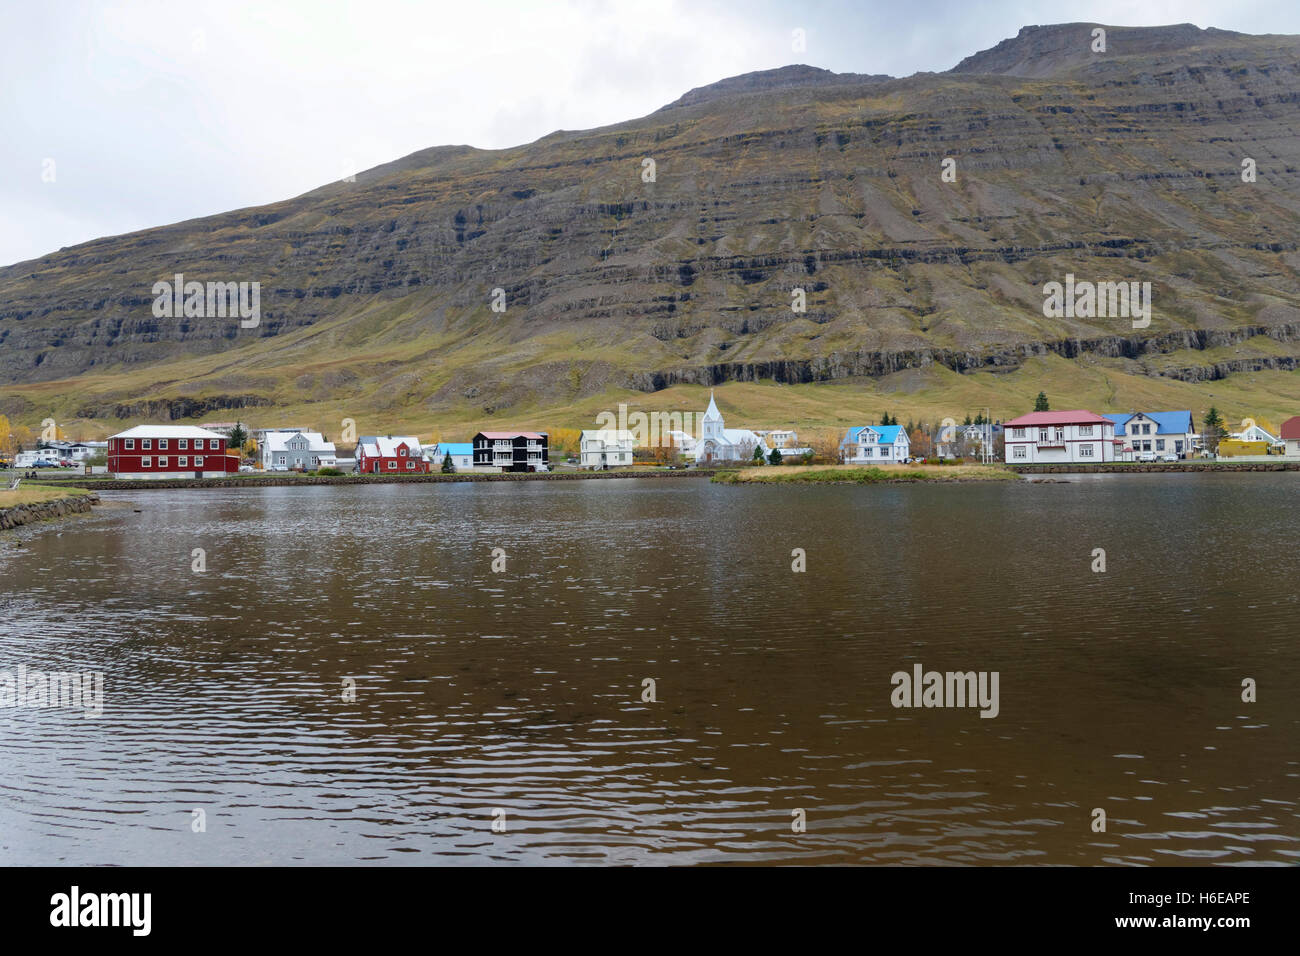 Seydisfjordur, East Iceland, North Atlantic, Europe - Stock Image